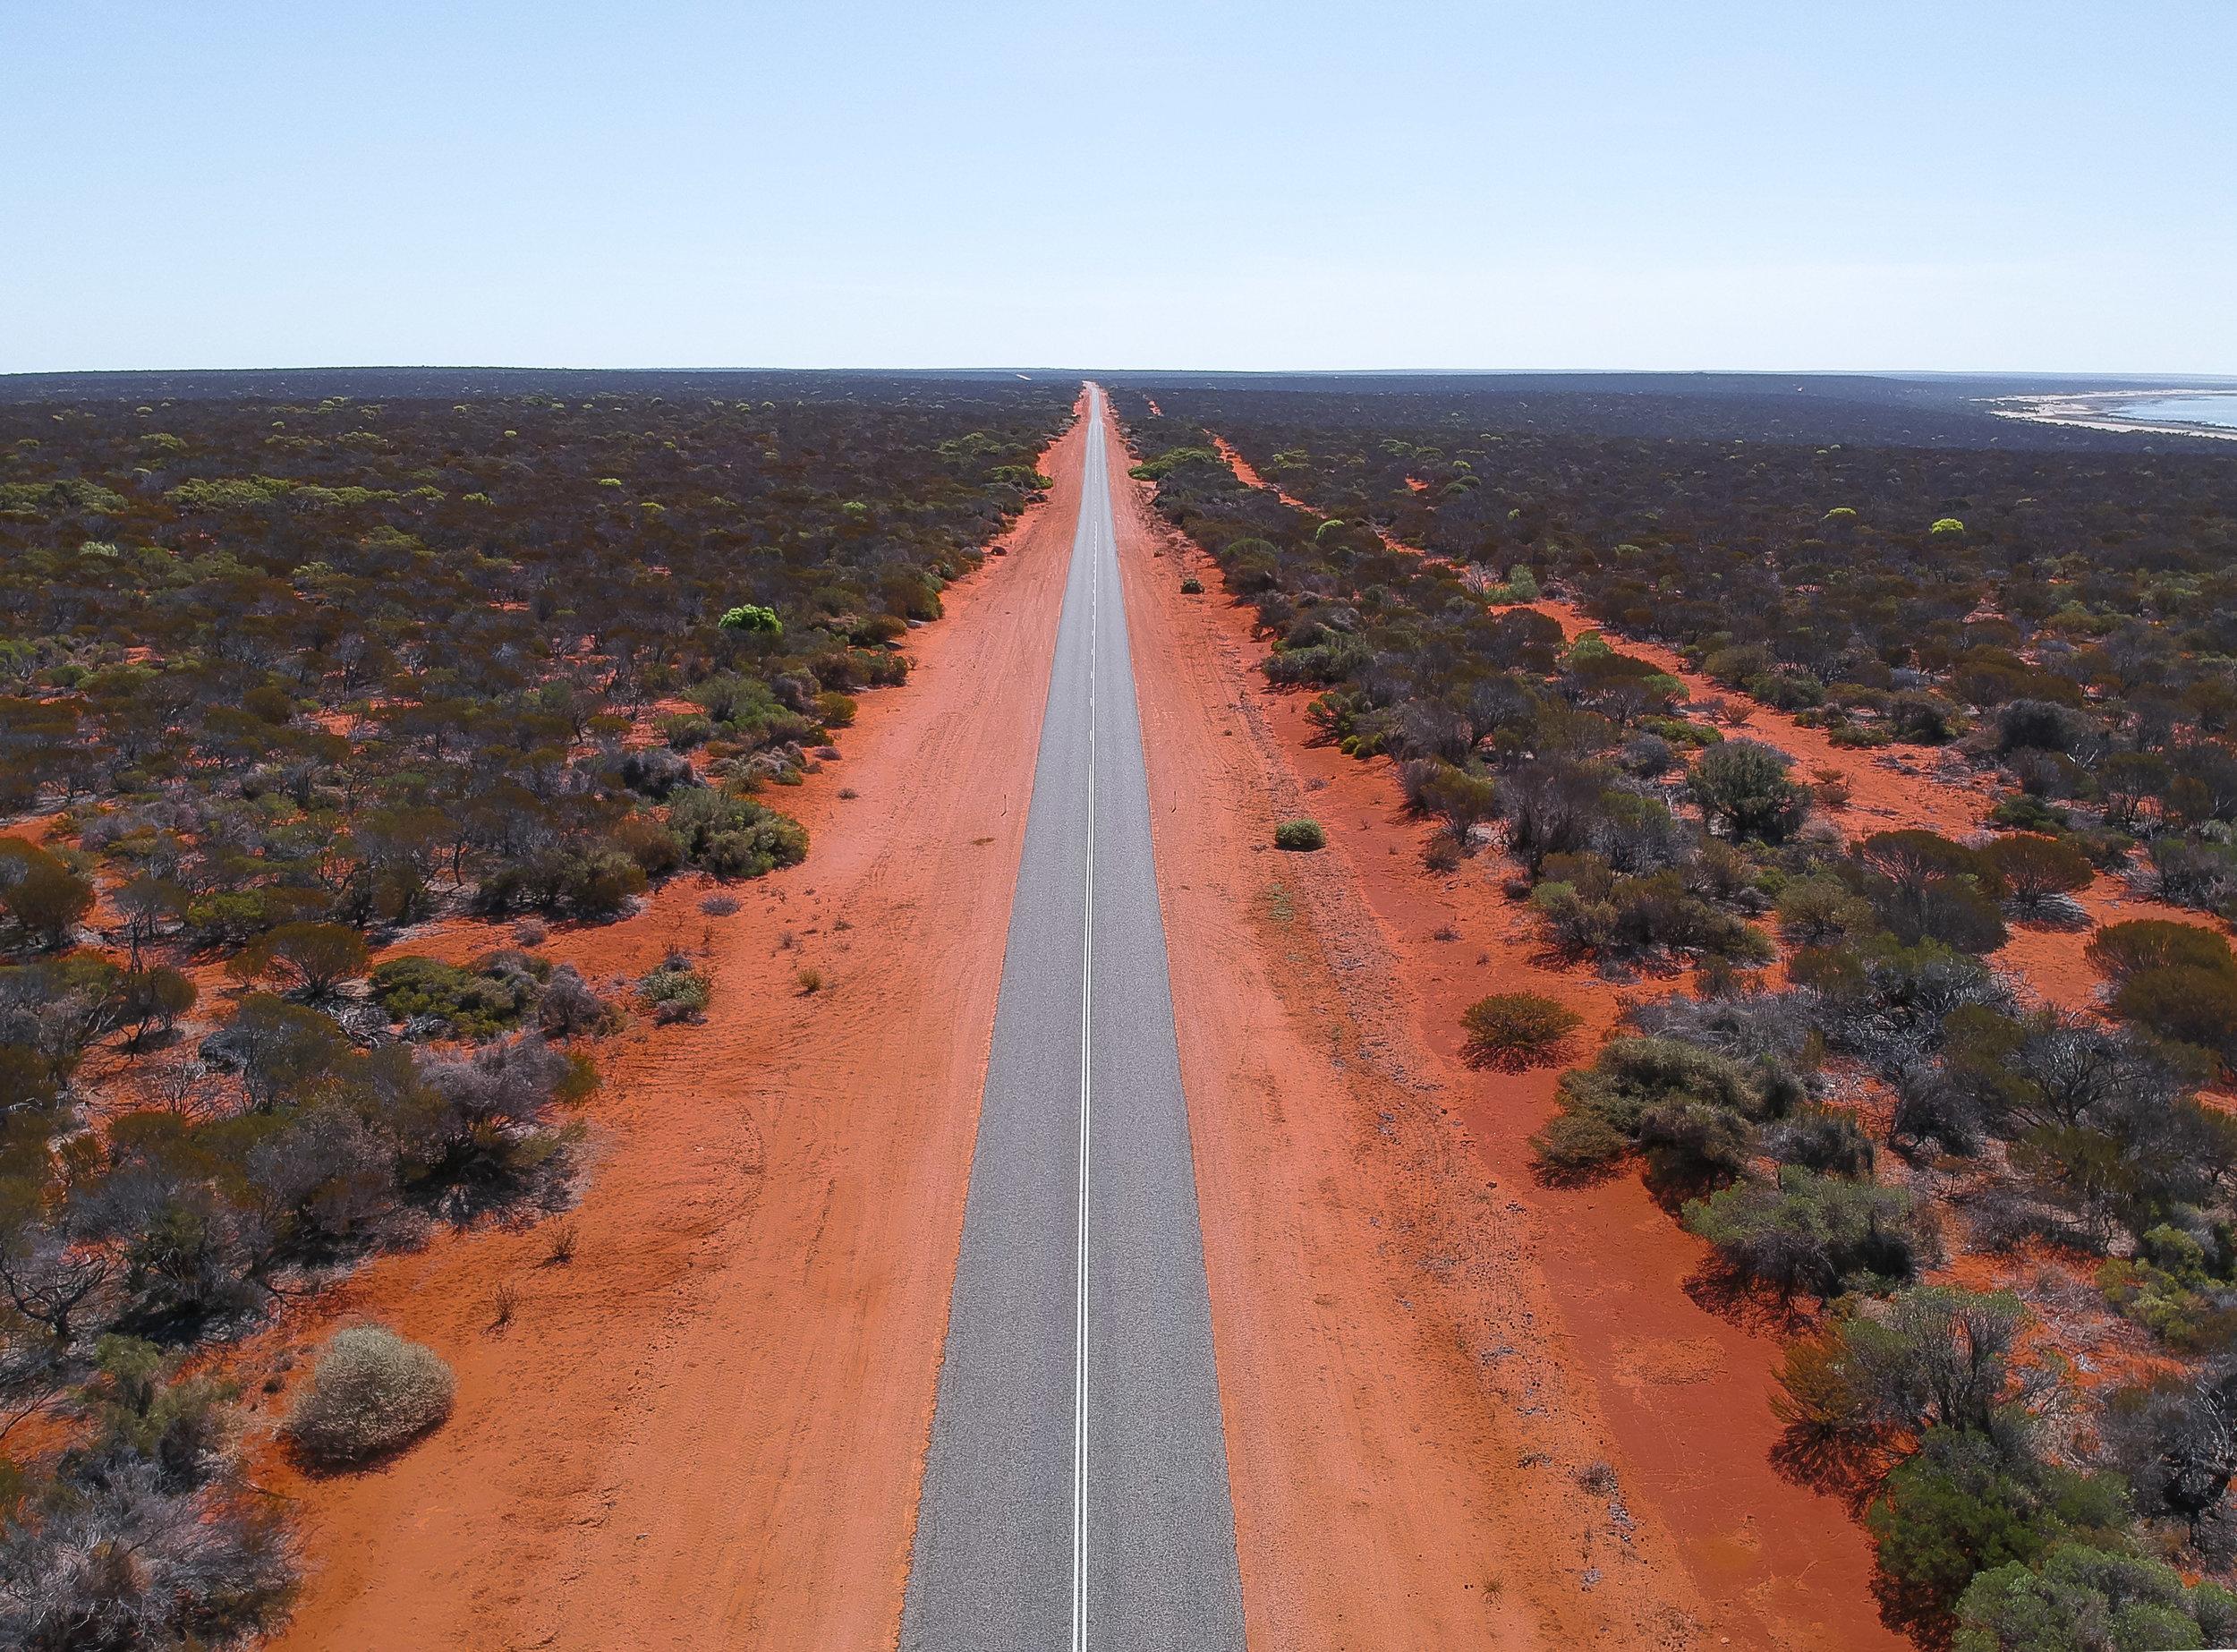 curio.trips.australia.western.red.road.drone.jpg